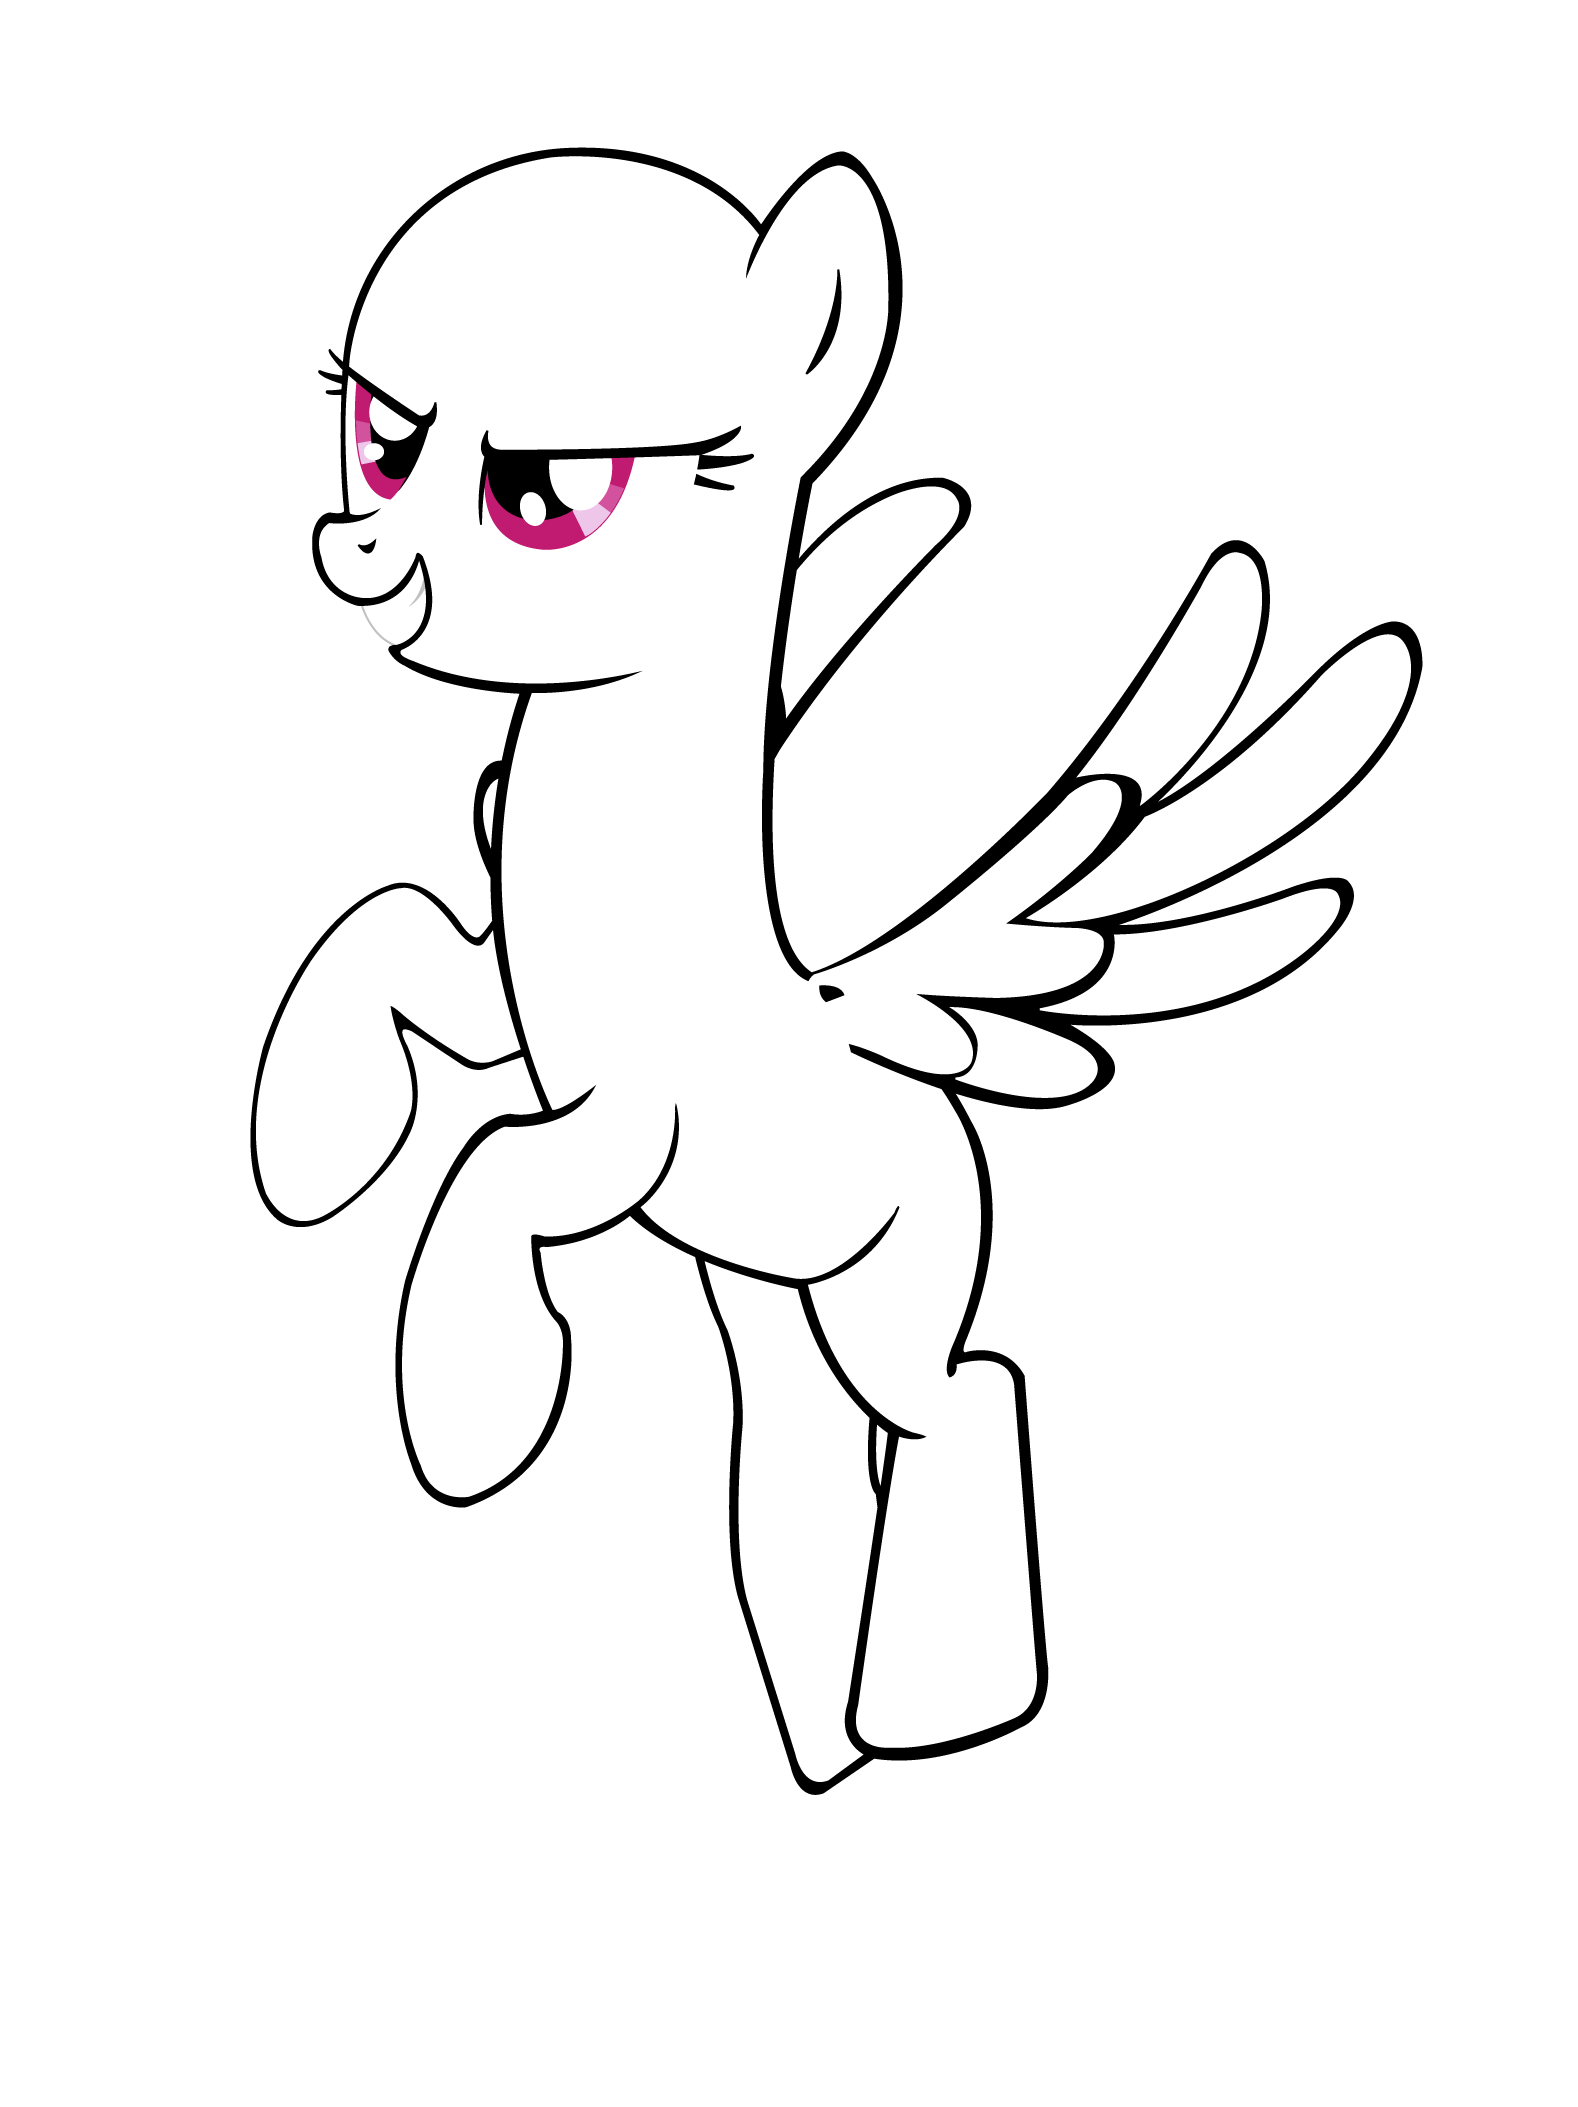 Another Pony base 03: Pegasus.